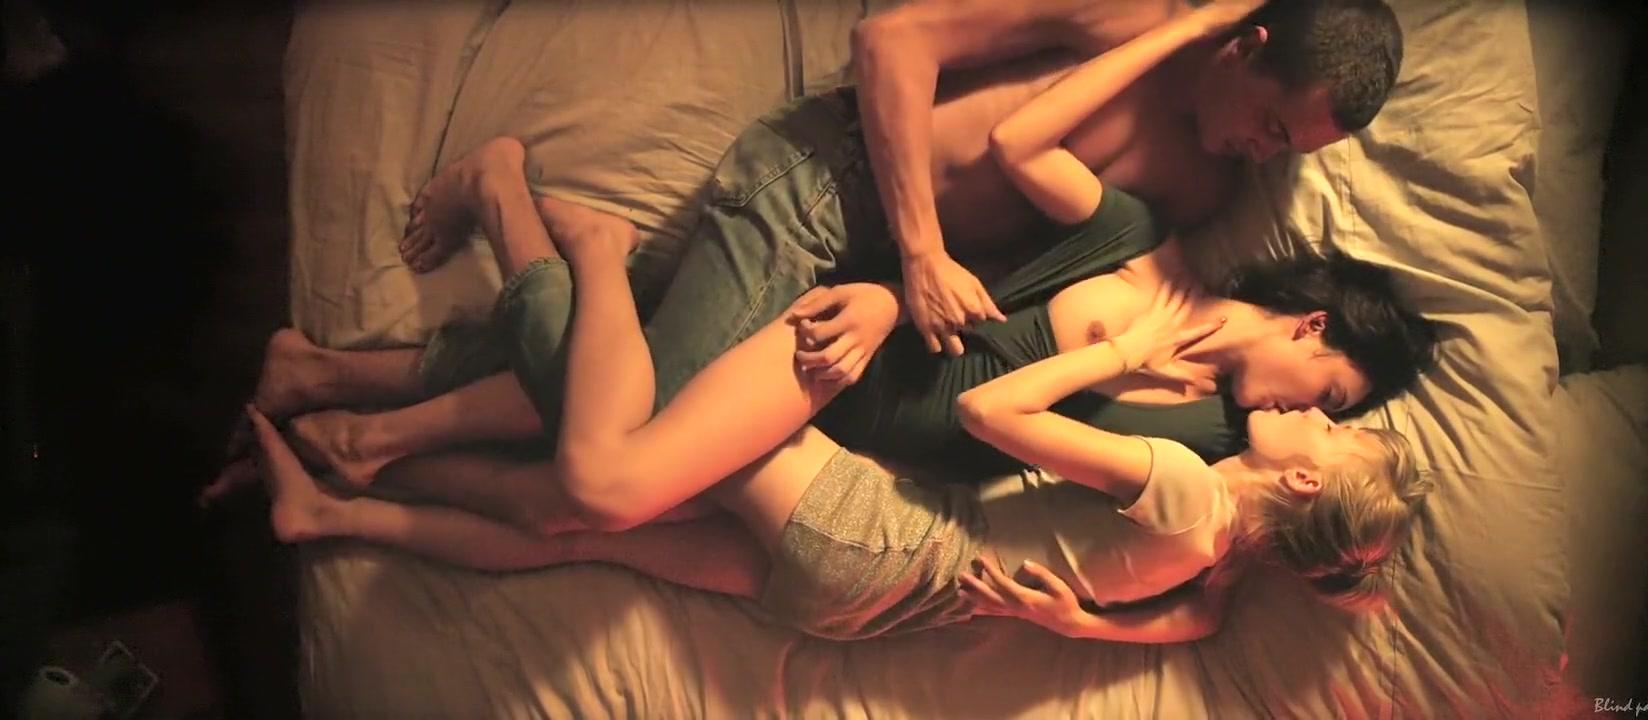 Naked Gallery Threesome bangalore